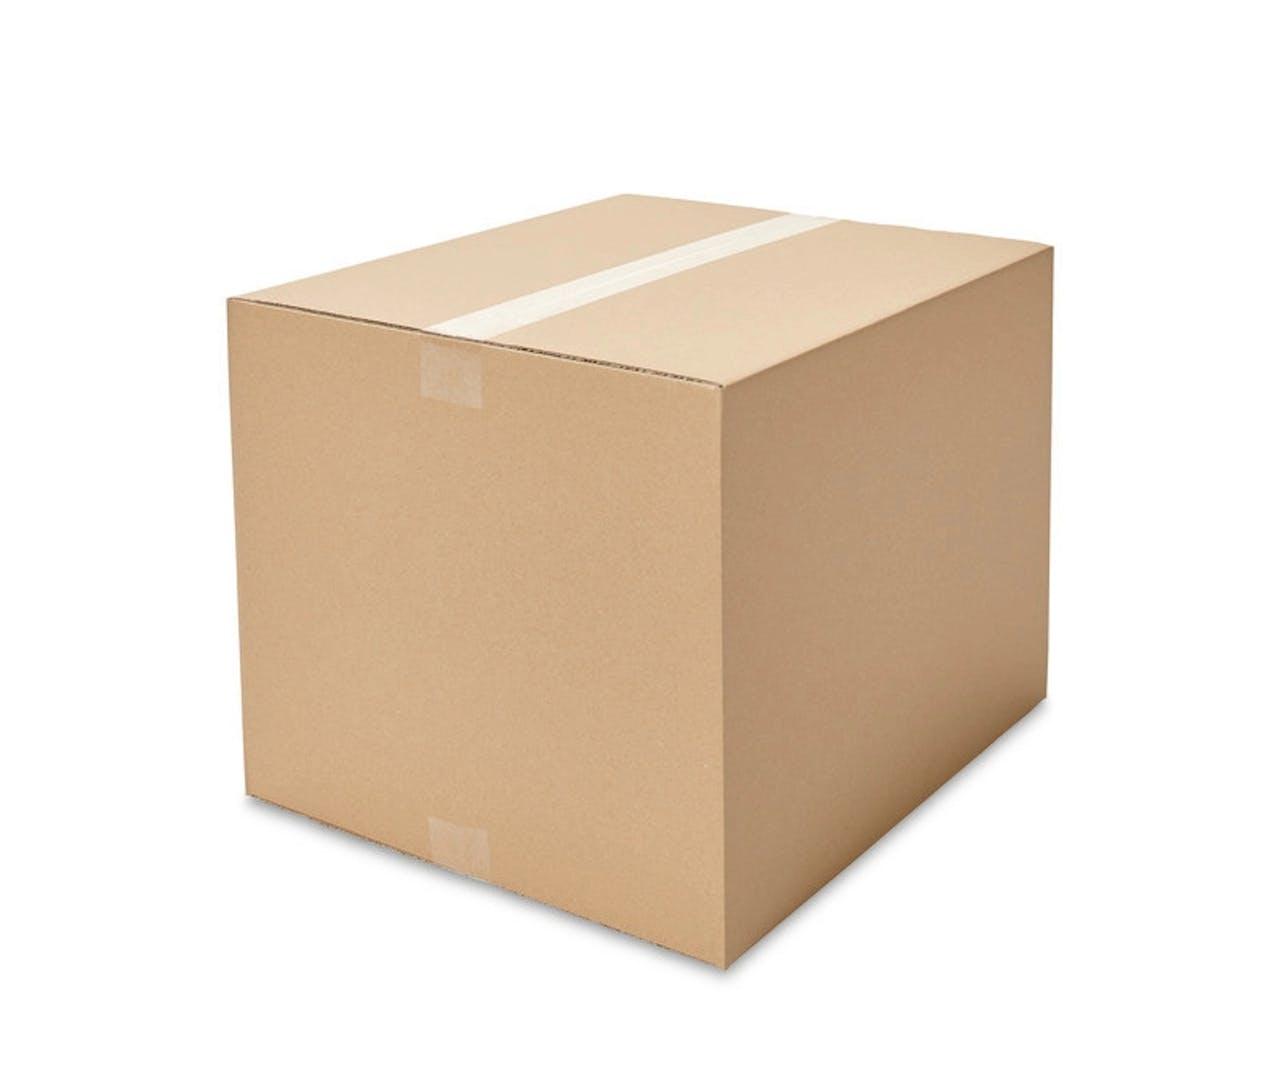 Wellpapp-Faltkartons ECONOMY, Länge 400 bis 449 mm, VAR: eke182